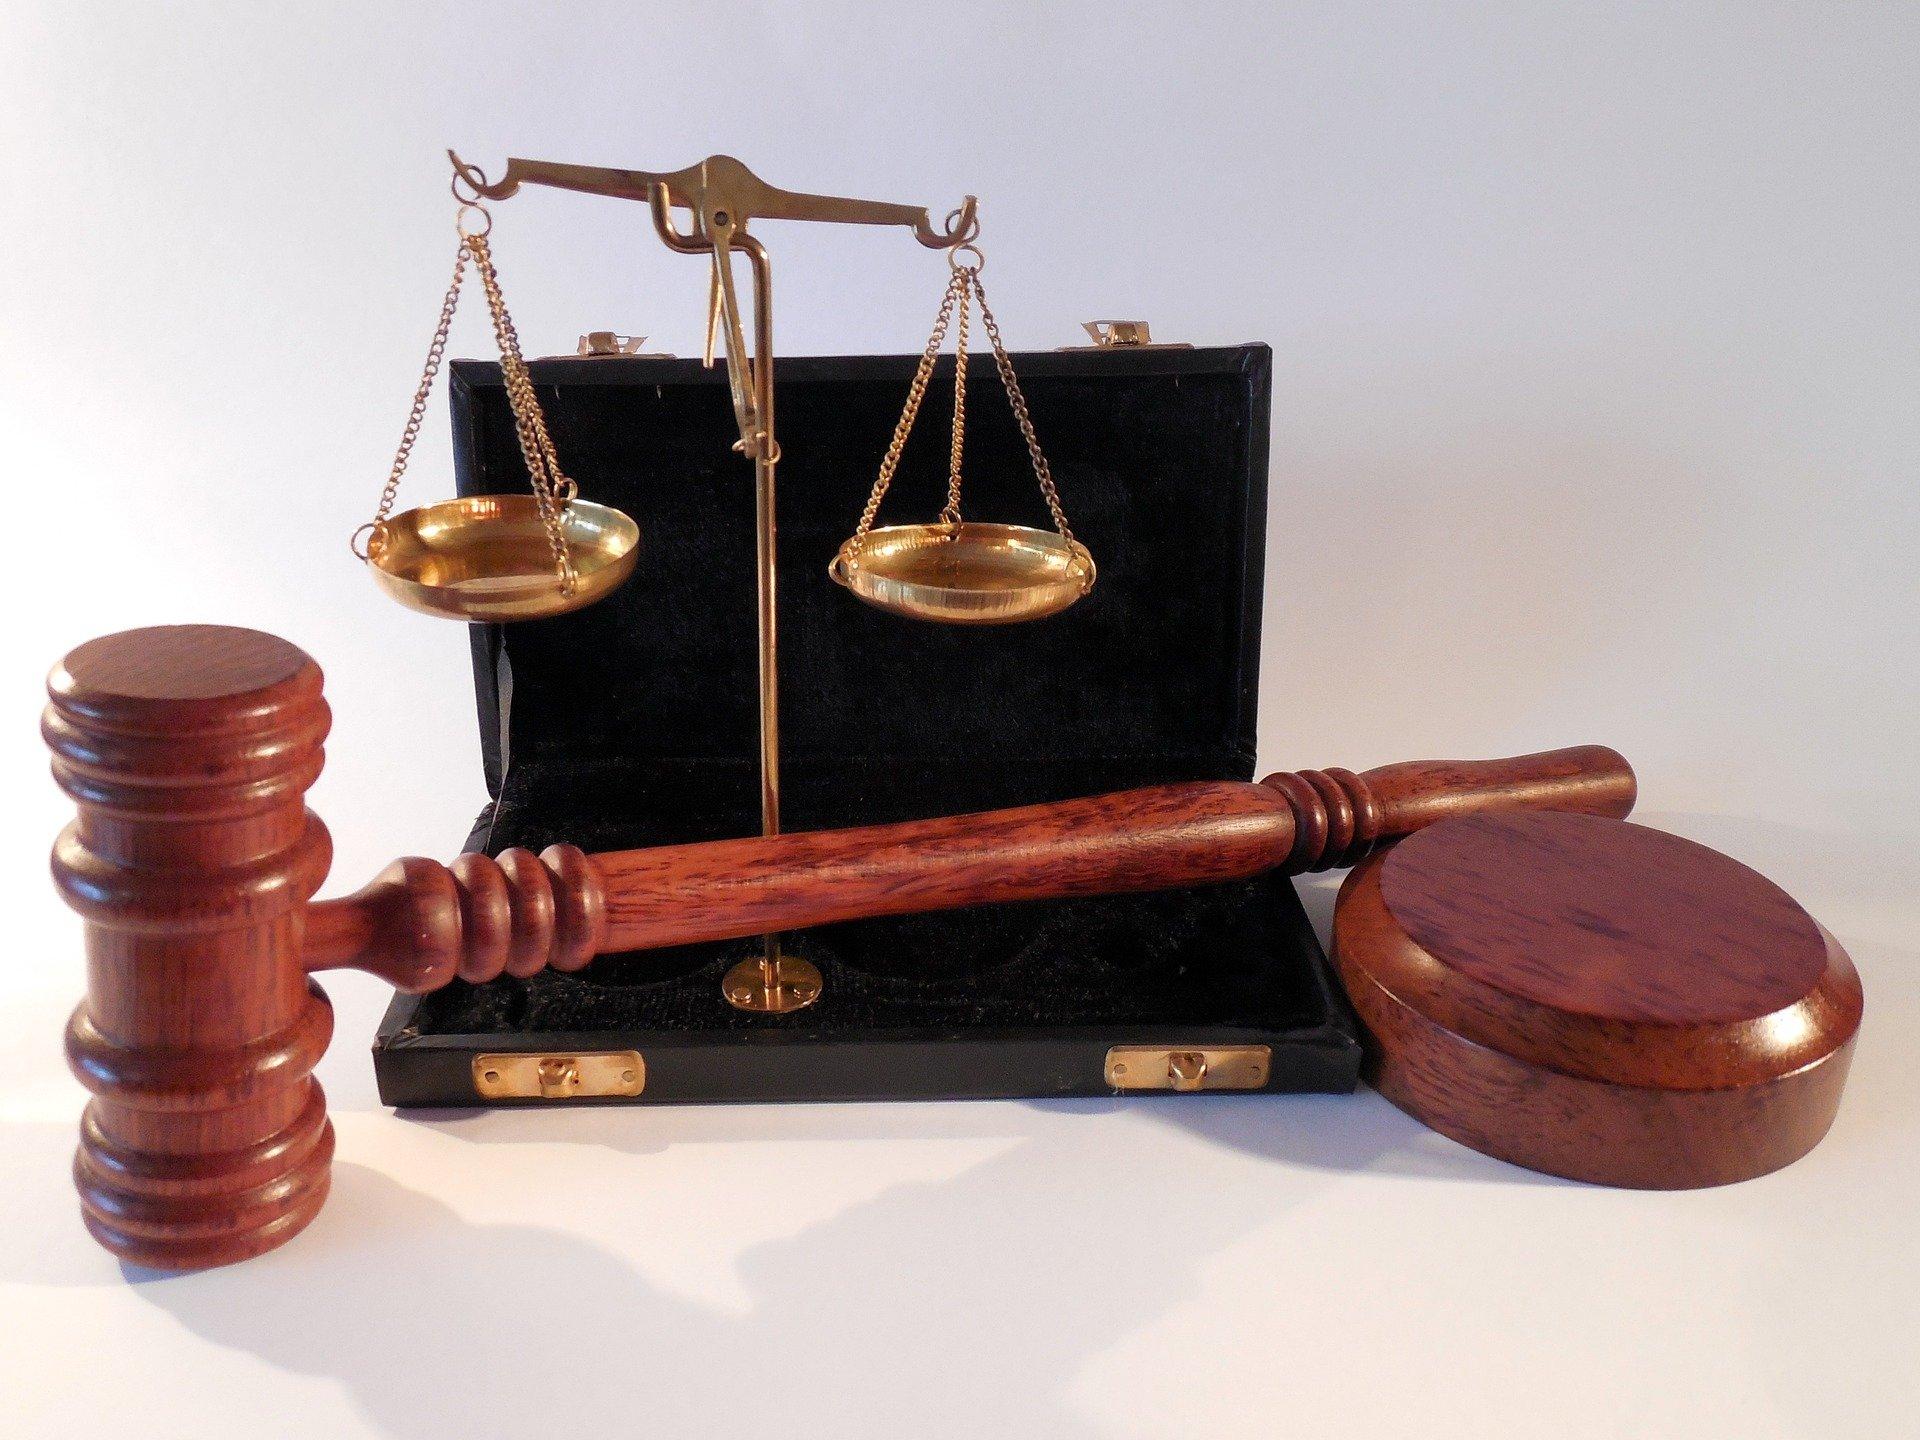 symbole prawa-waga, młotek, Kodeks Karny